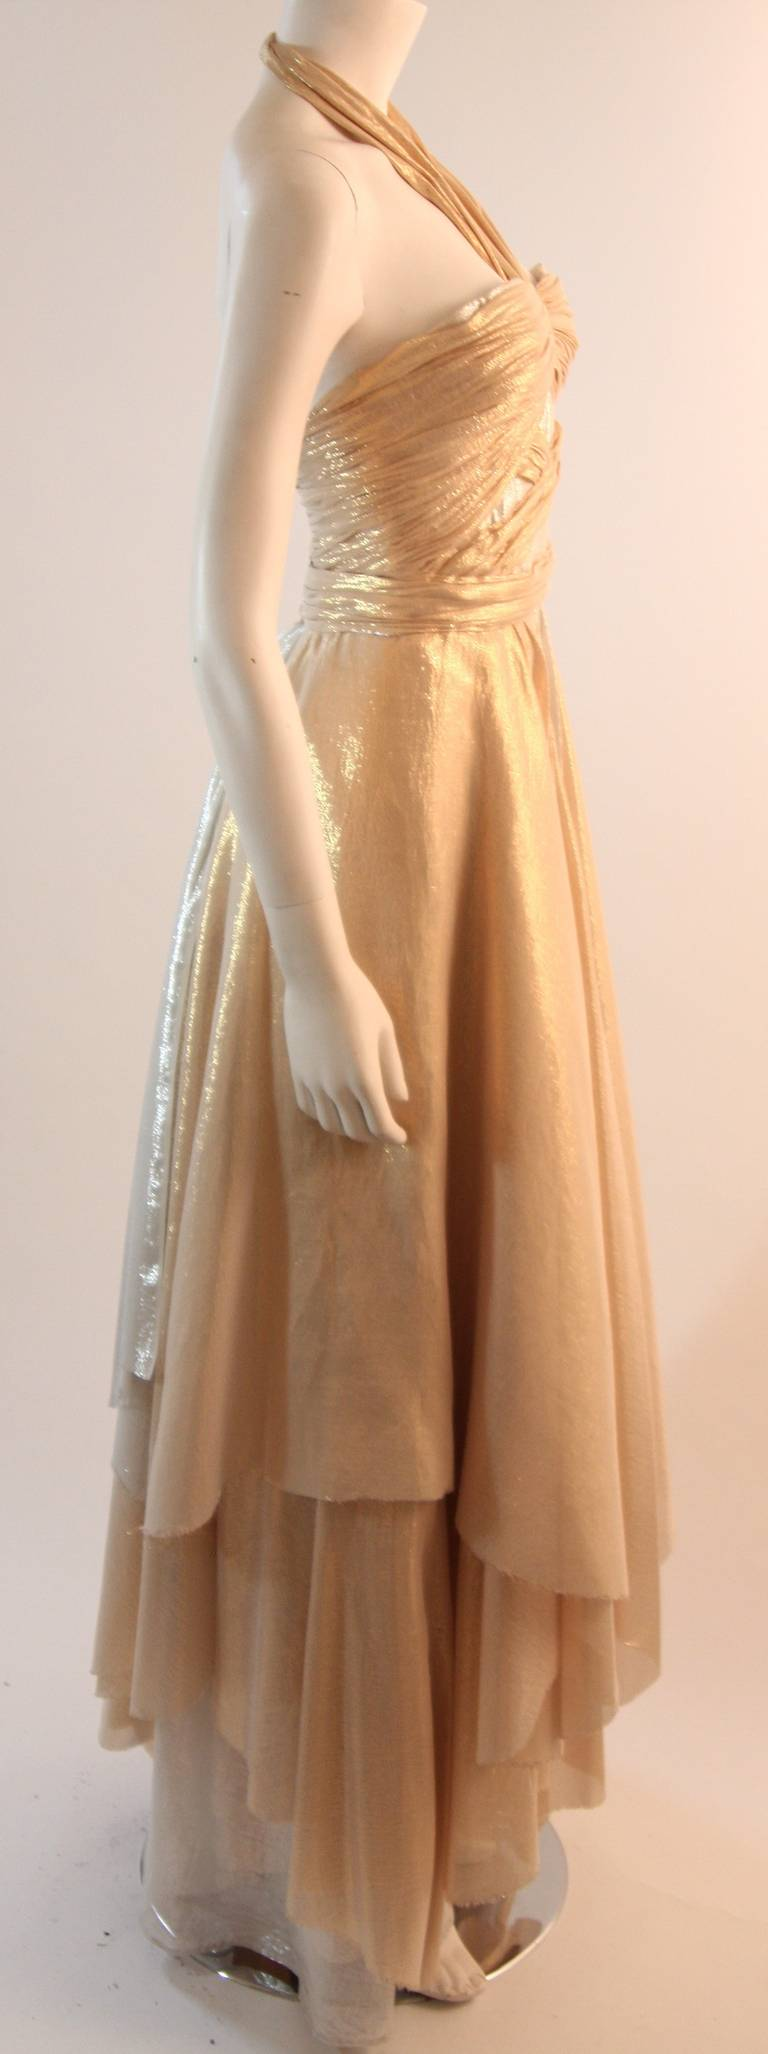 Elizabeth Mason Gold Lame Custom Couture Gown 4